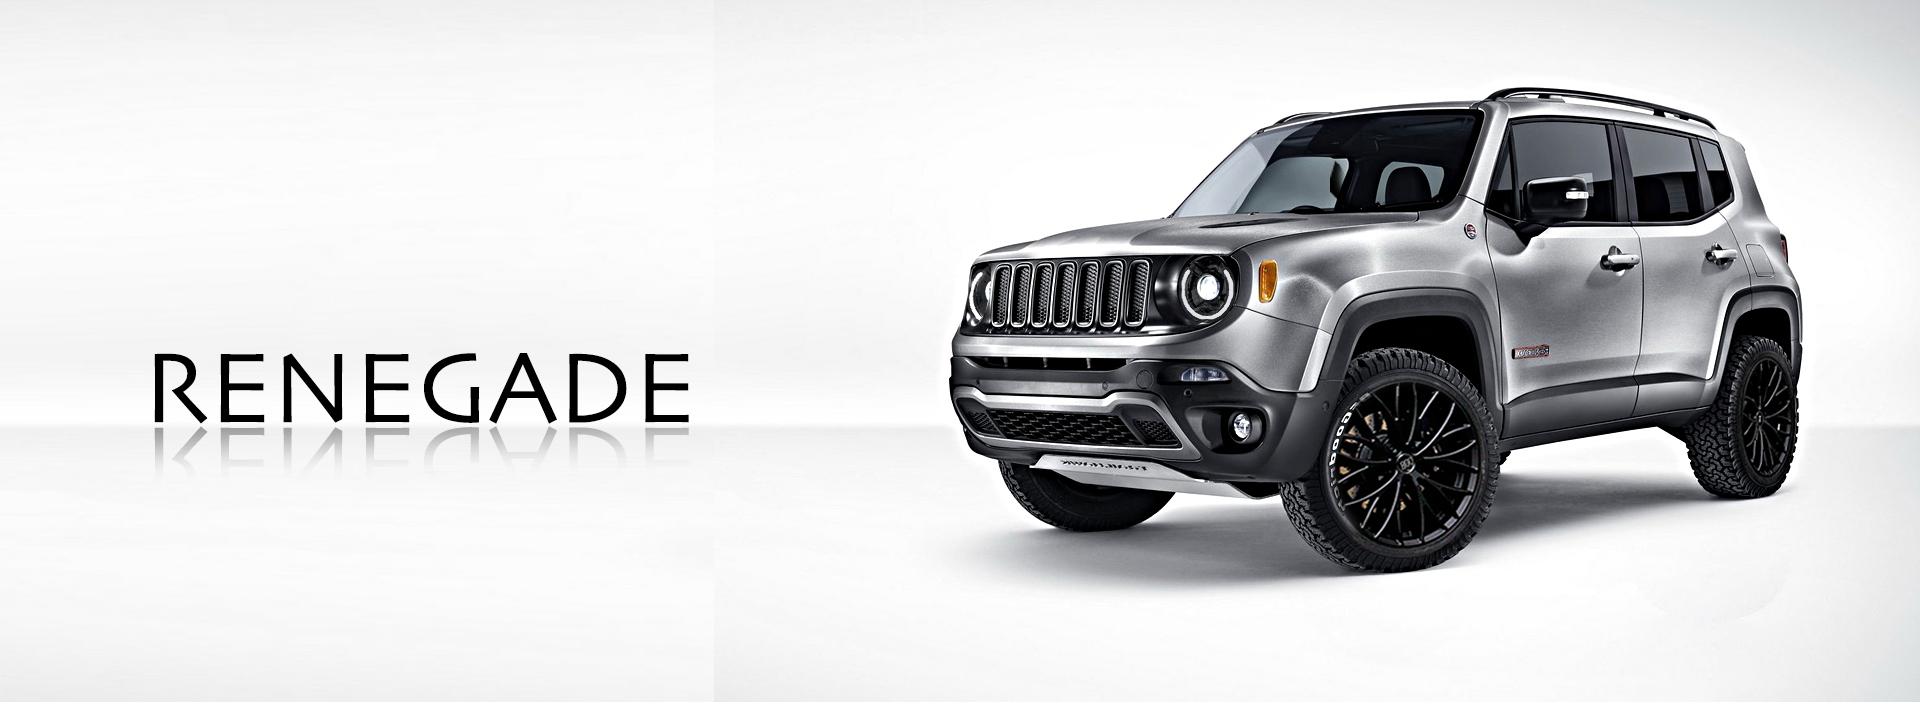 jeep renegade accessories design renegade new jeep forum. Black Bedroom Furniture Sets. Home Design Ideas